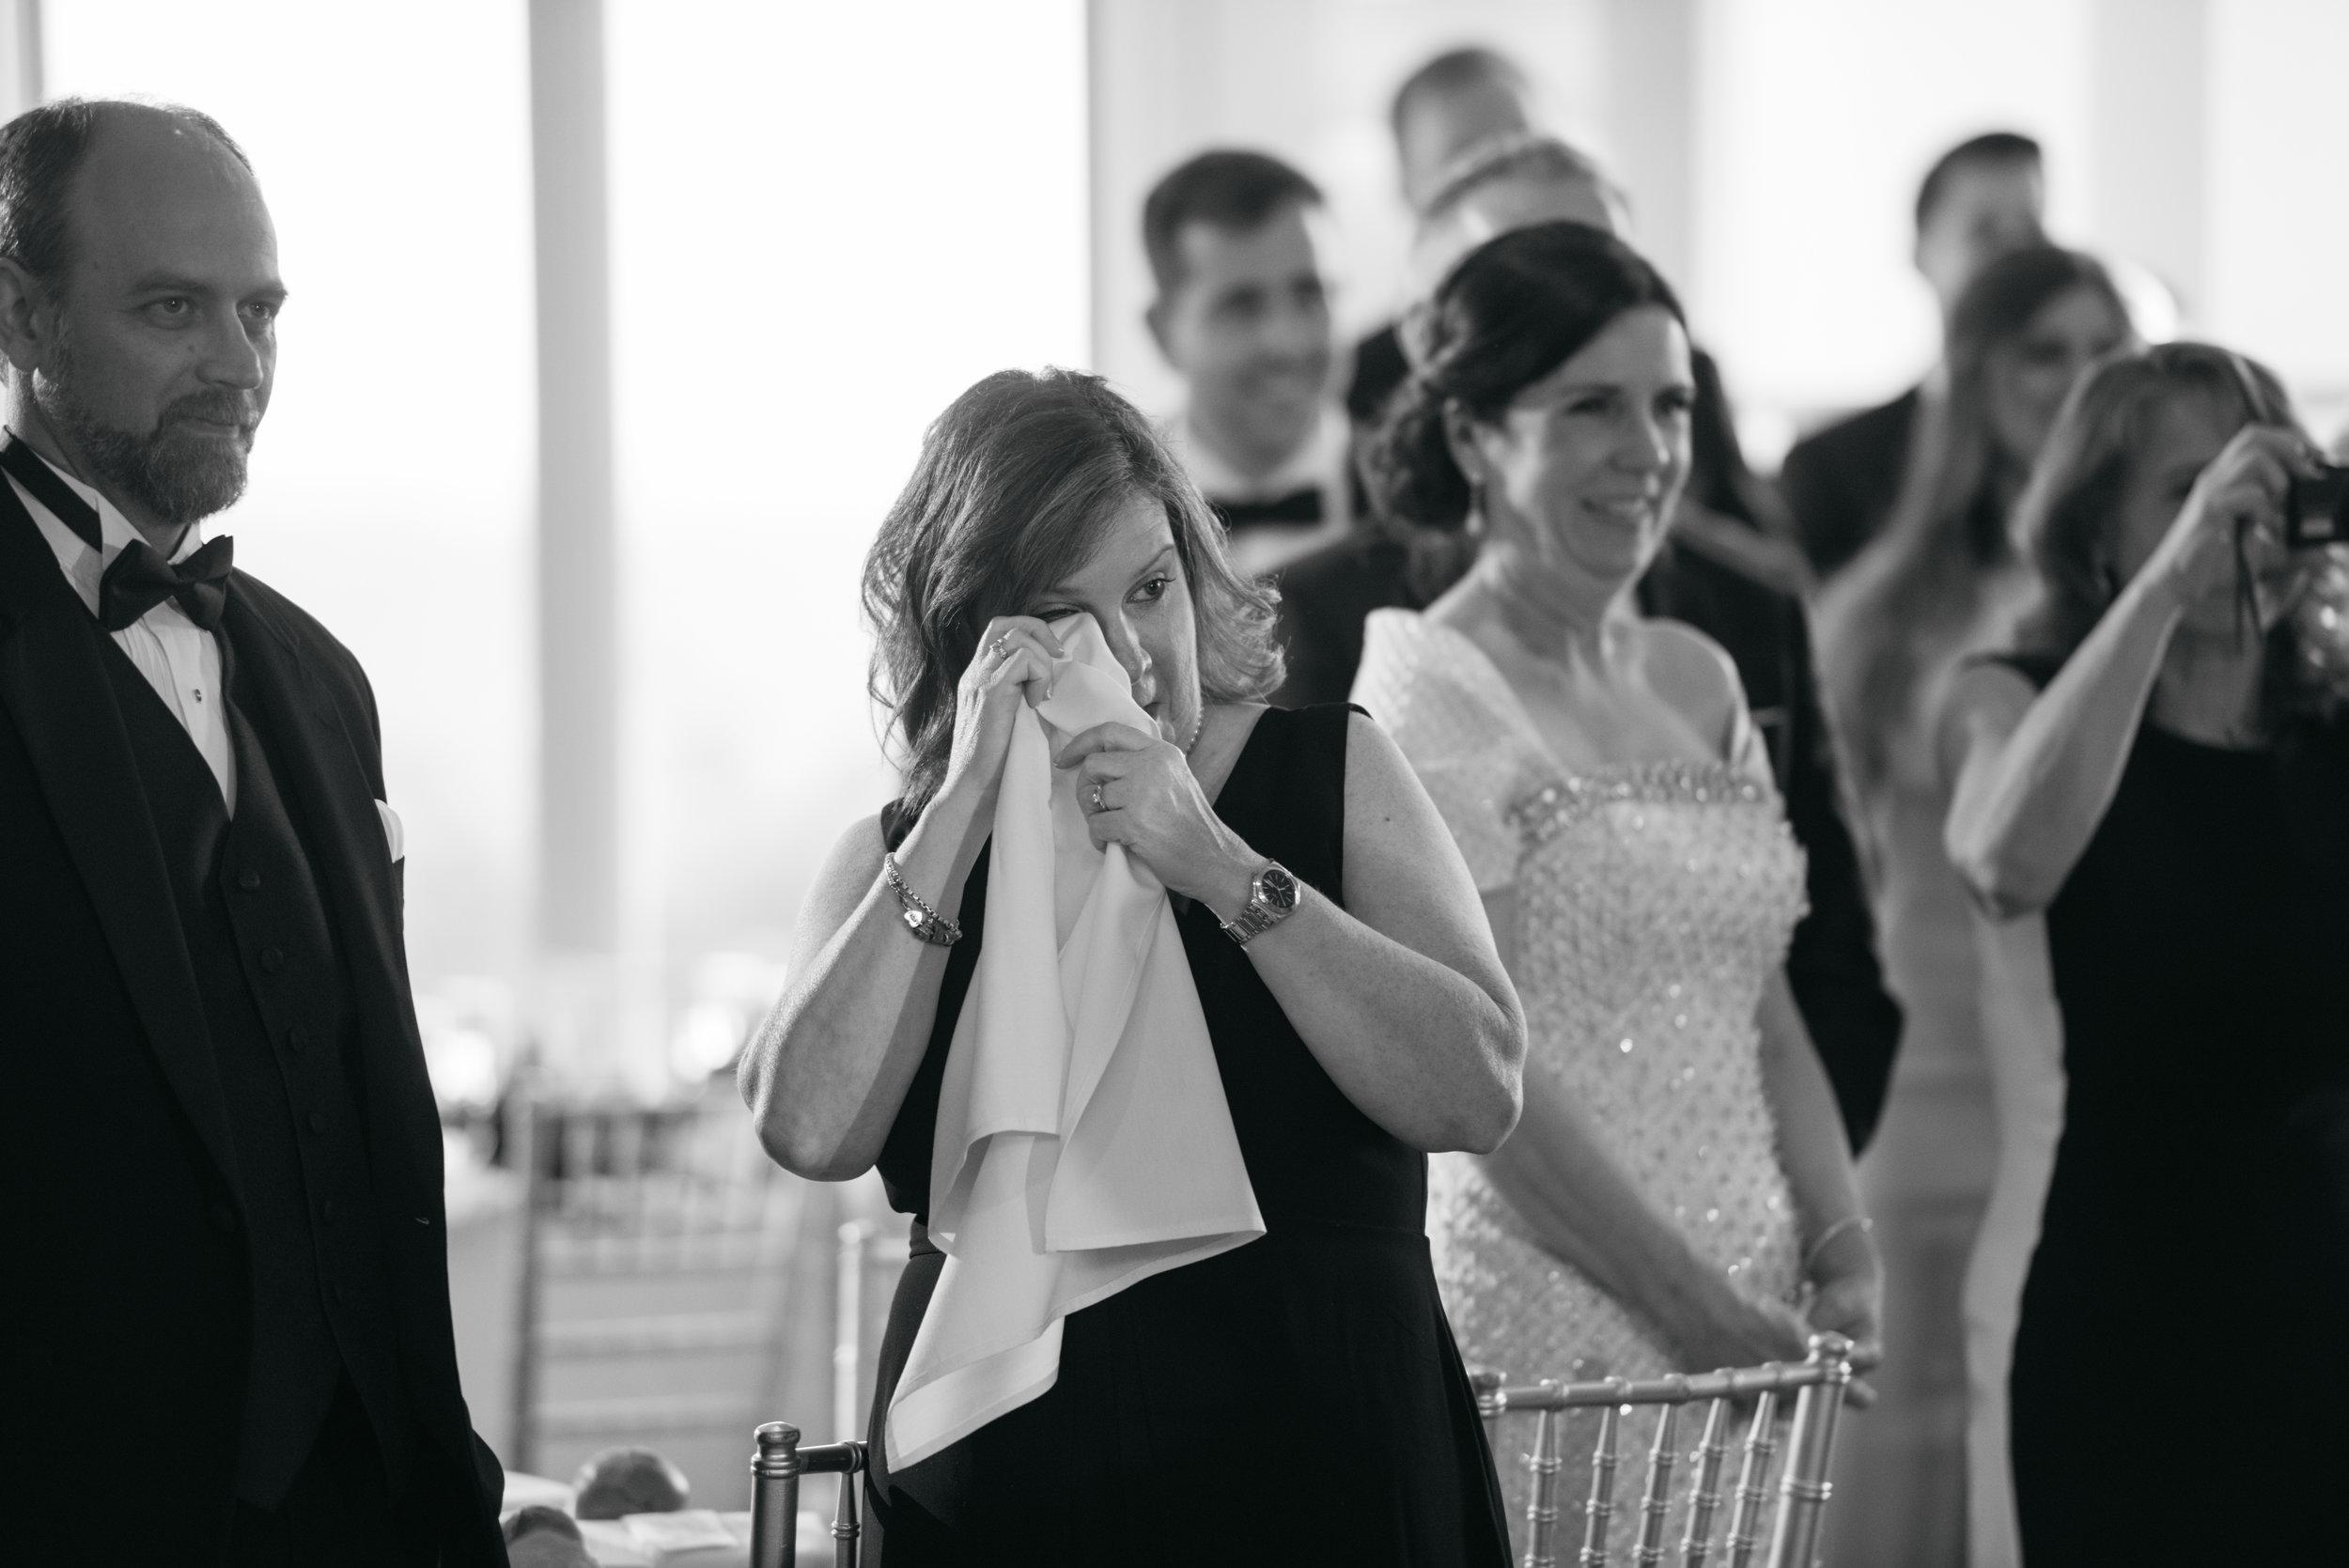 WeddingPhotos | NJPhotographer | Highlights-7-4.jpg